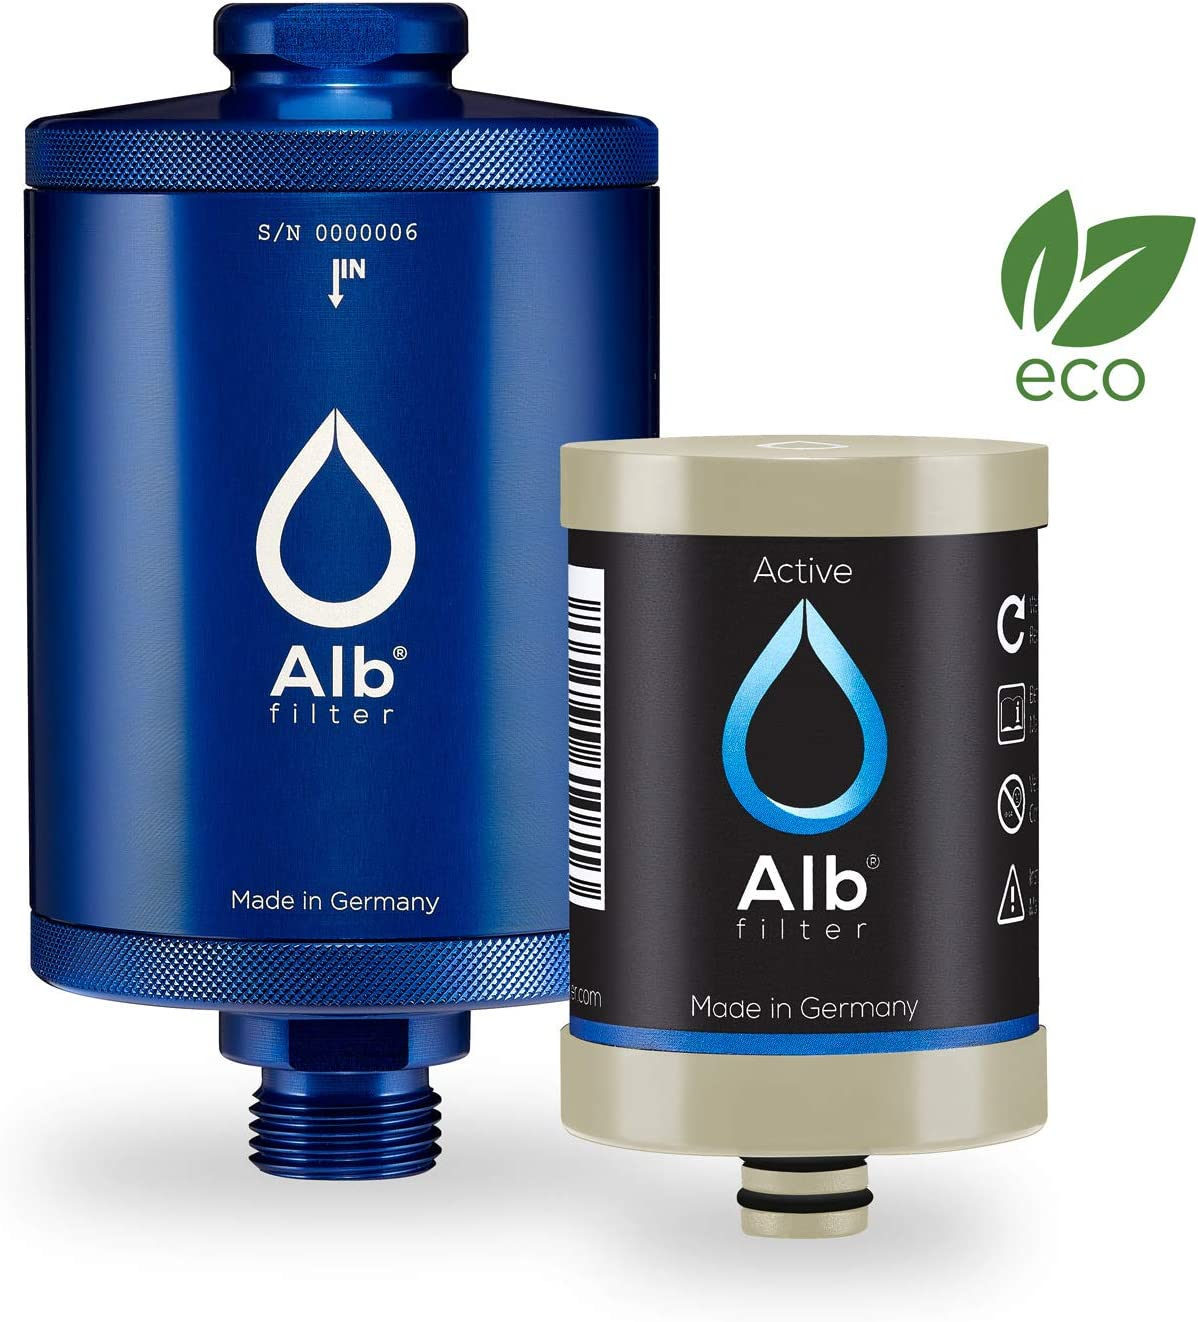 alb filtro® Active Eco biodegradable filtro de agua potable de ...